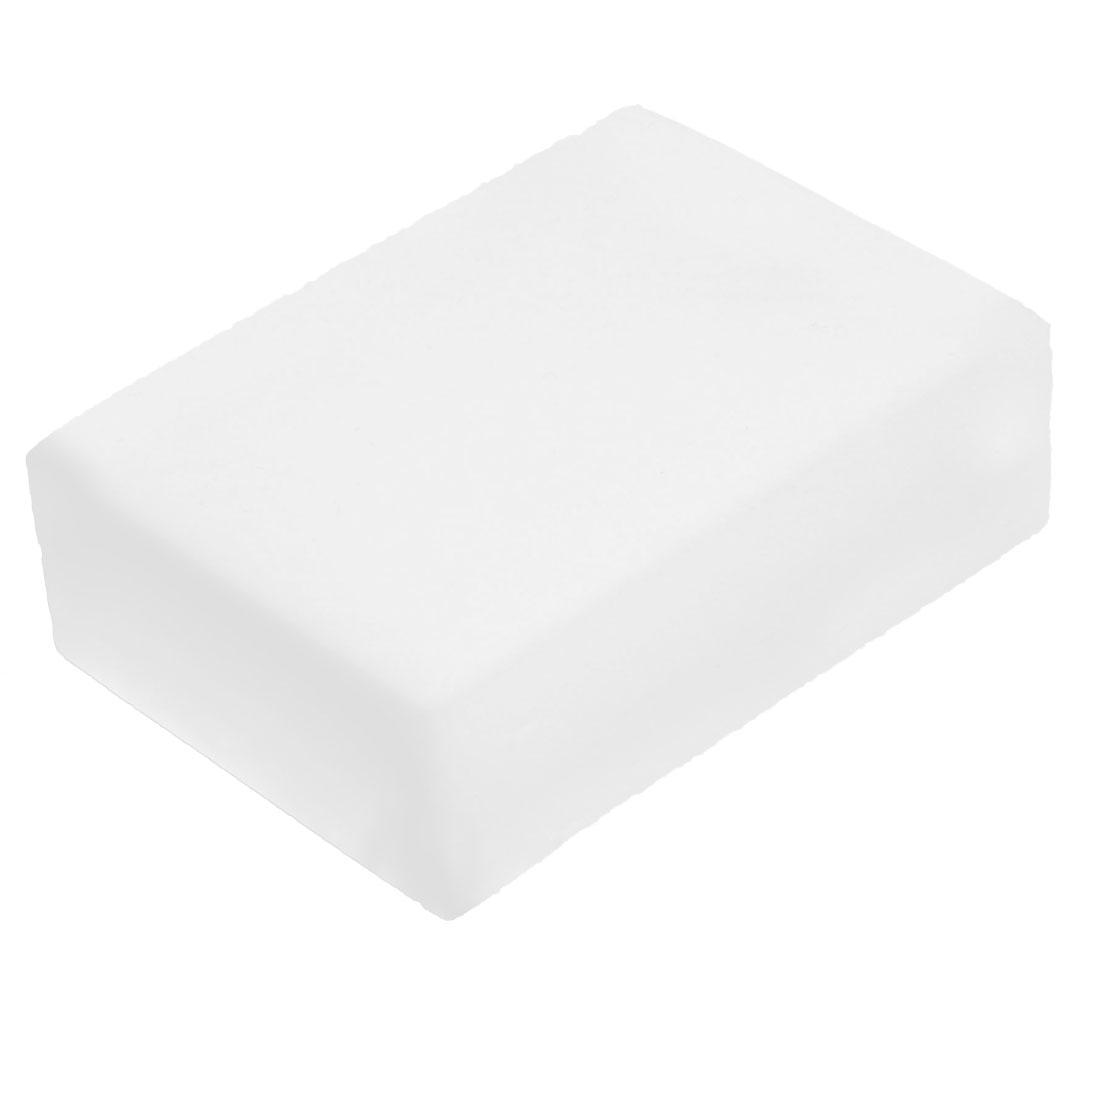 Home Kitchen Melamine Foam Flexible Dish Pan Descaling Cloth Clean Magic Brush